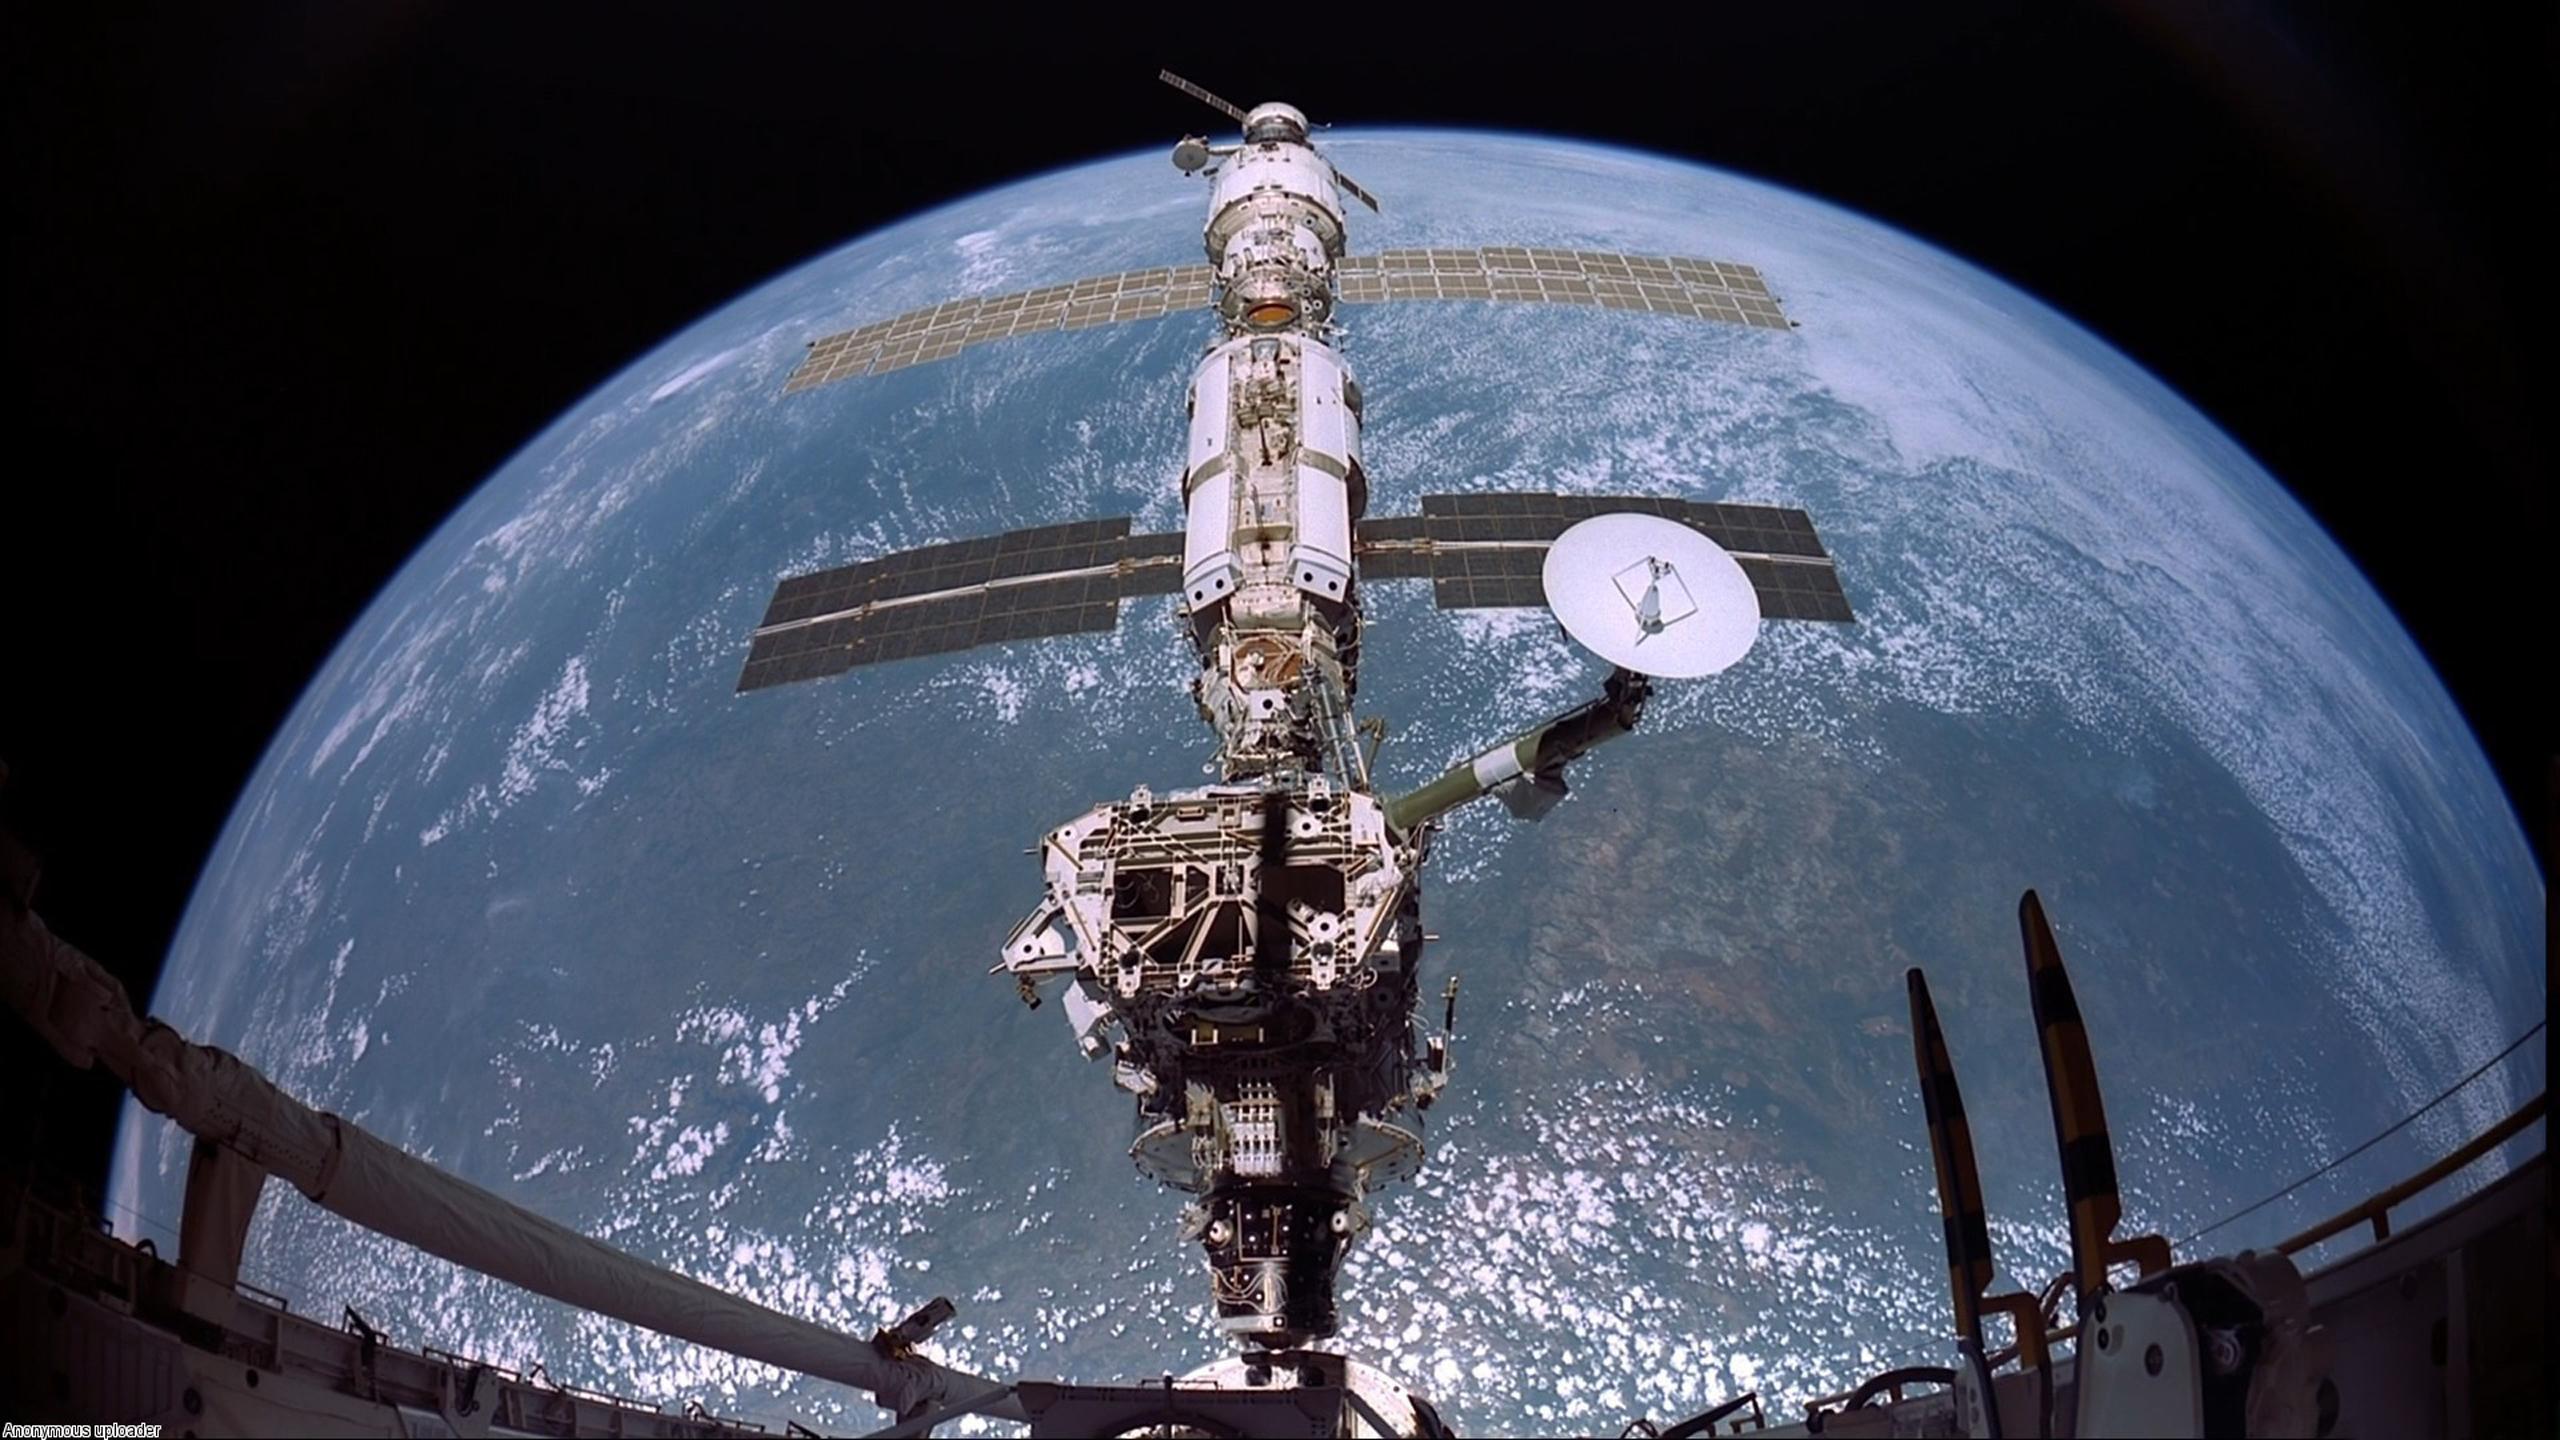 Aladdin Wallpaper Hd Earth Observation Satellite Wallpaper Hd 2560x1440